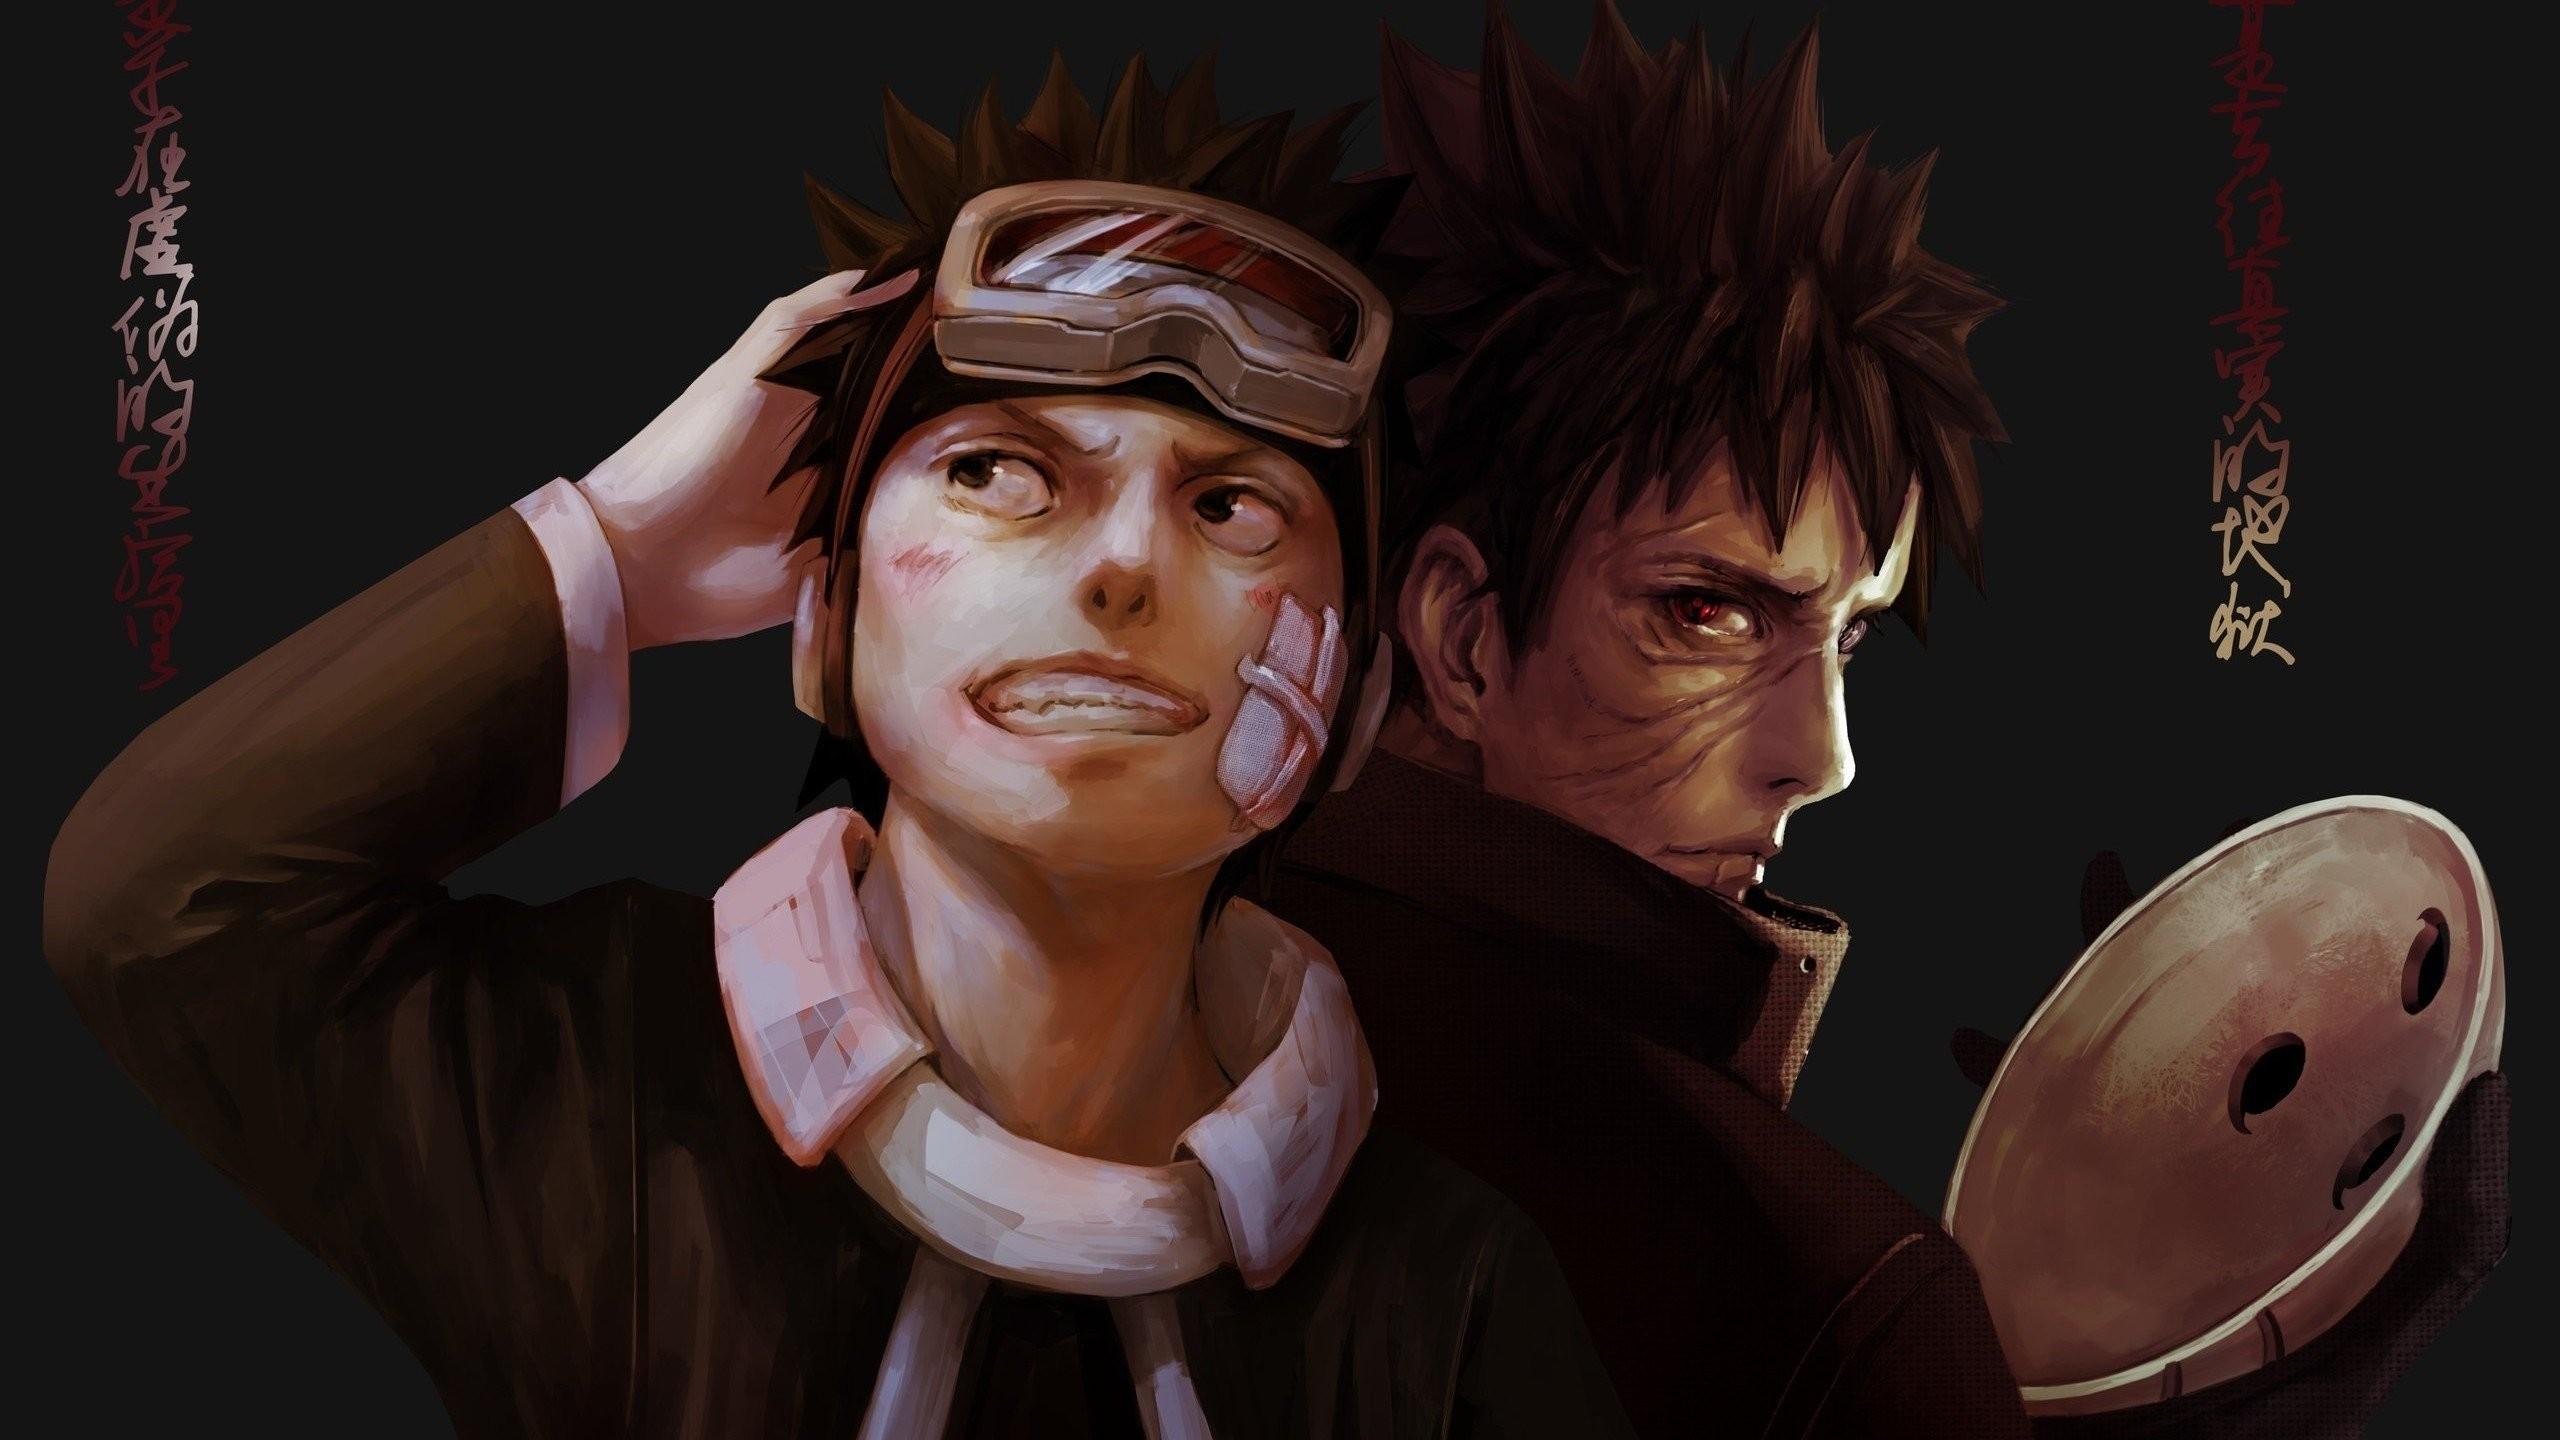 Res: 2560x1440, Naruto: Shippuden Sharingan Uchiha Obito Mangekyou Sharingan Tobi Rinnegan  wallpaper |  | 280520 | WallpaperUP